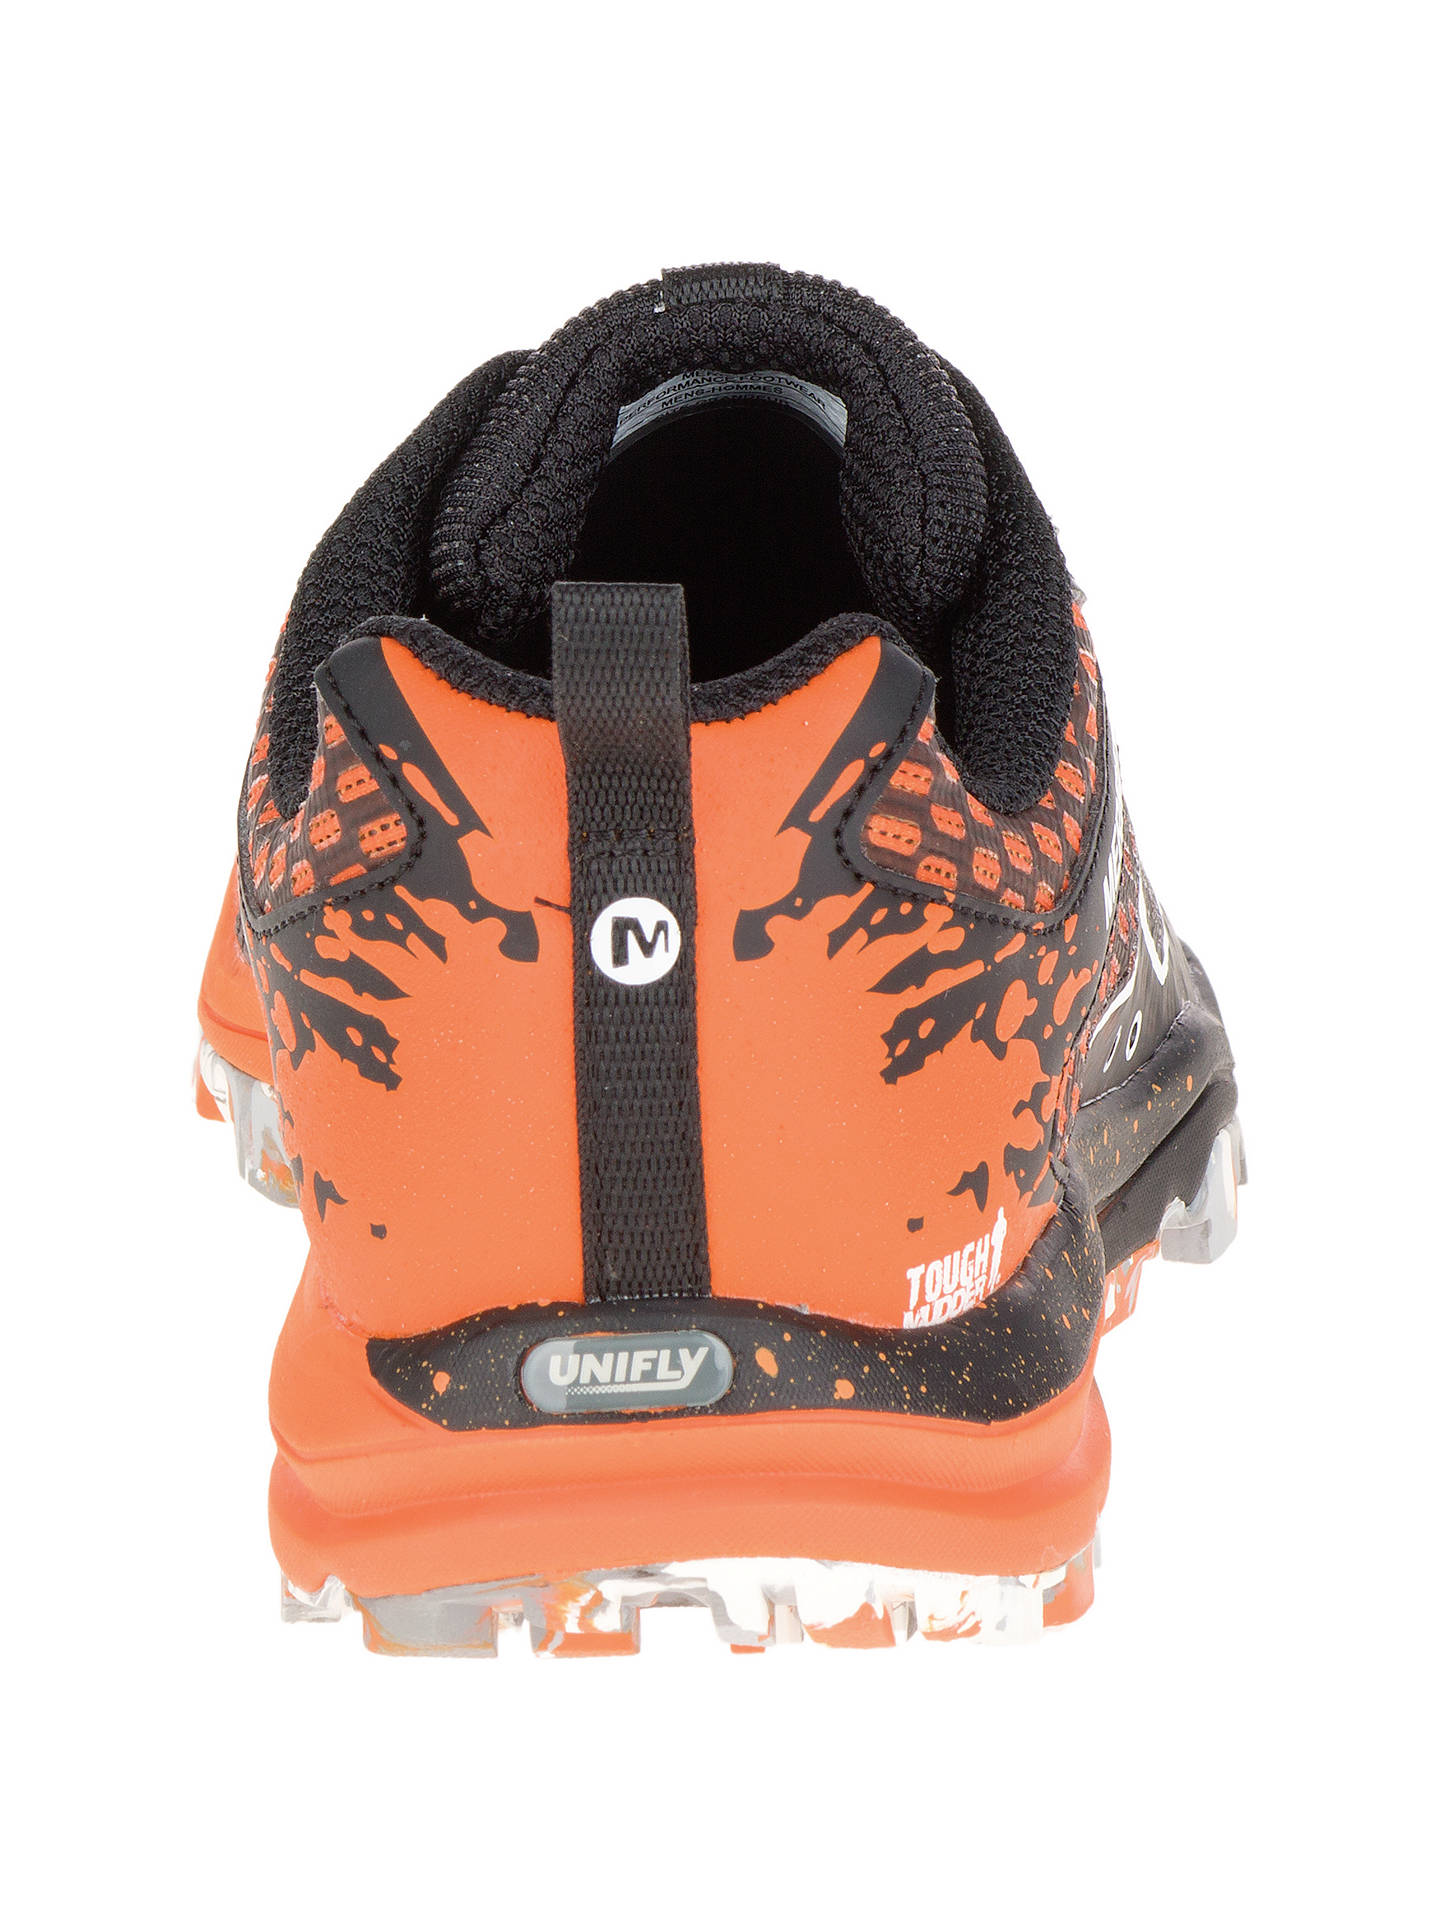 Merrell All Out Crush Tough Mudder Men's Trail Running Shoes